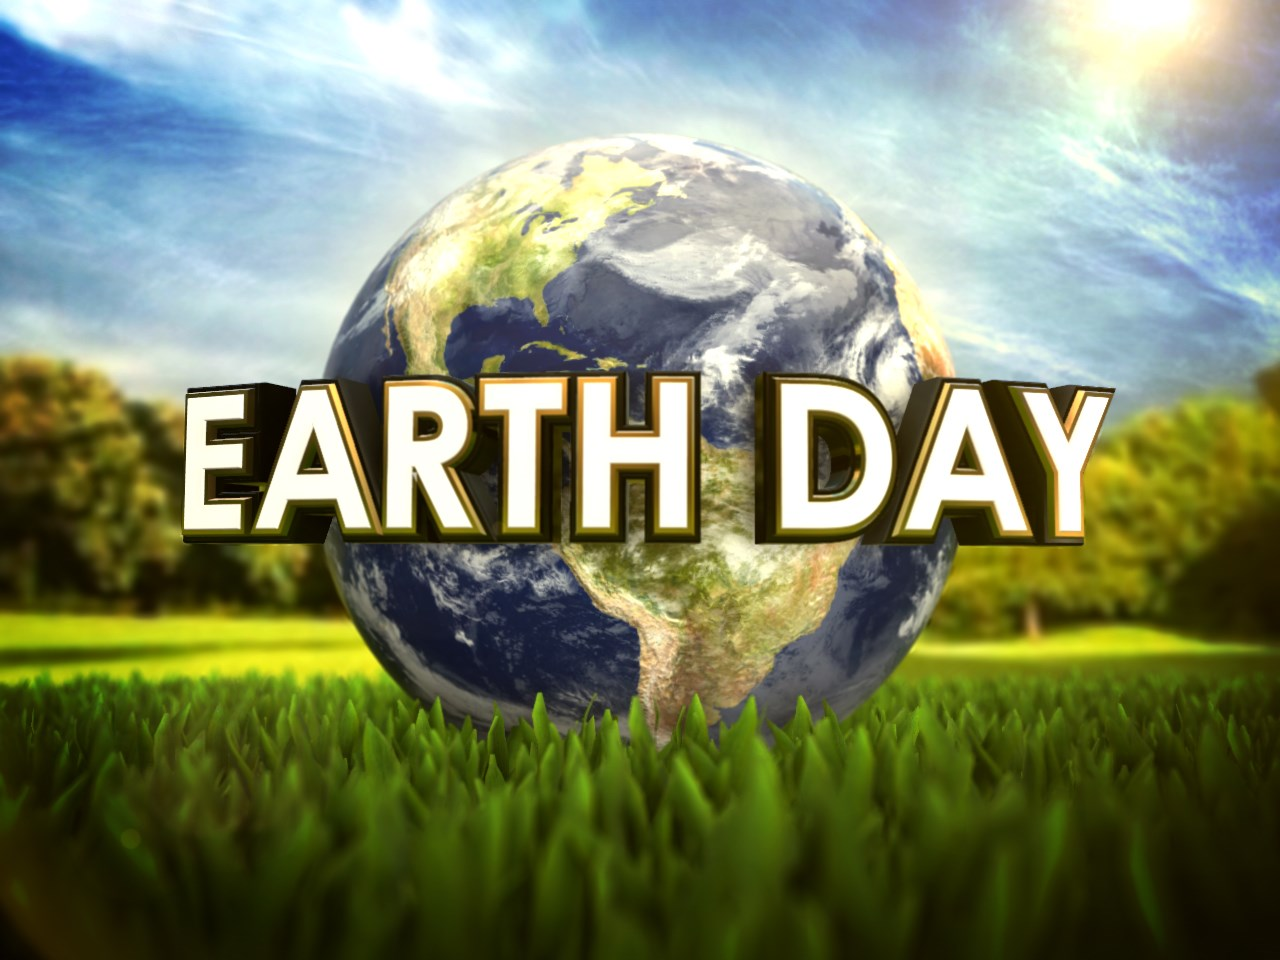 EARTH DAY_1492781520780.jpg